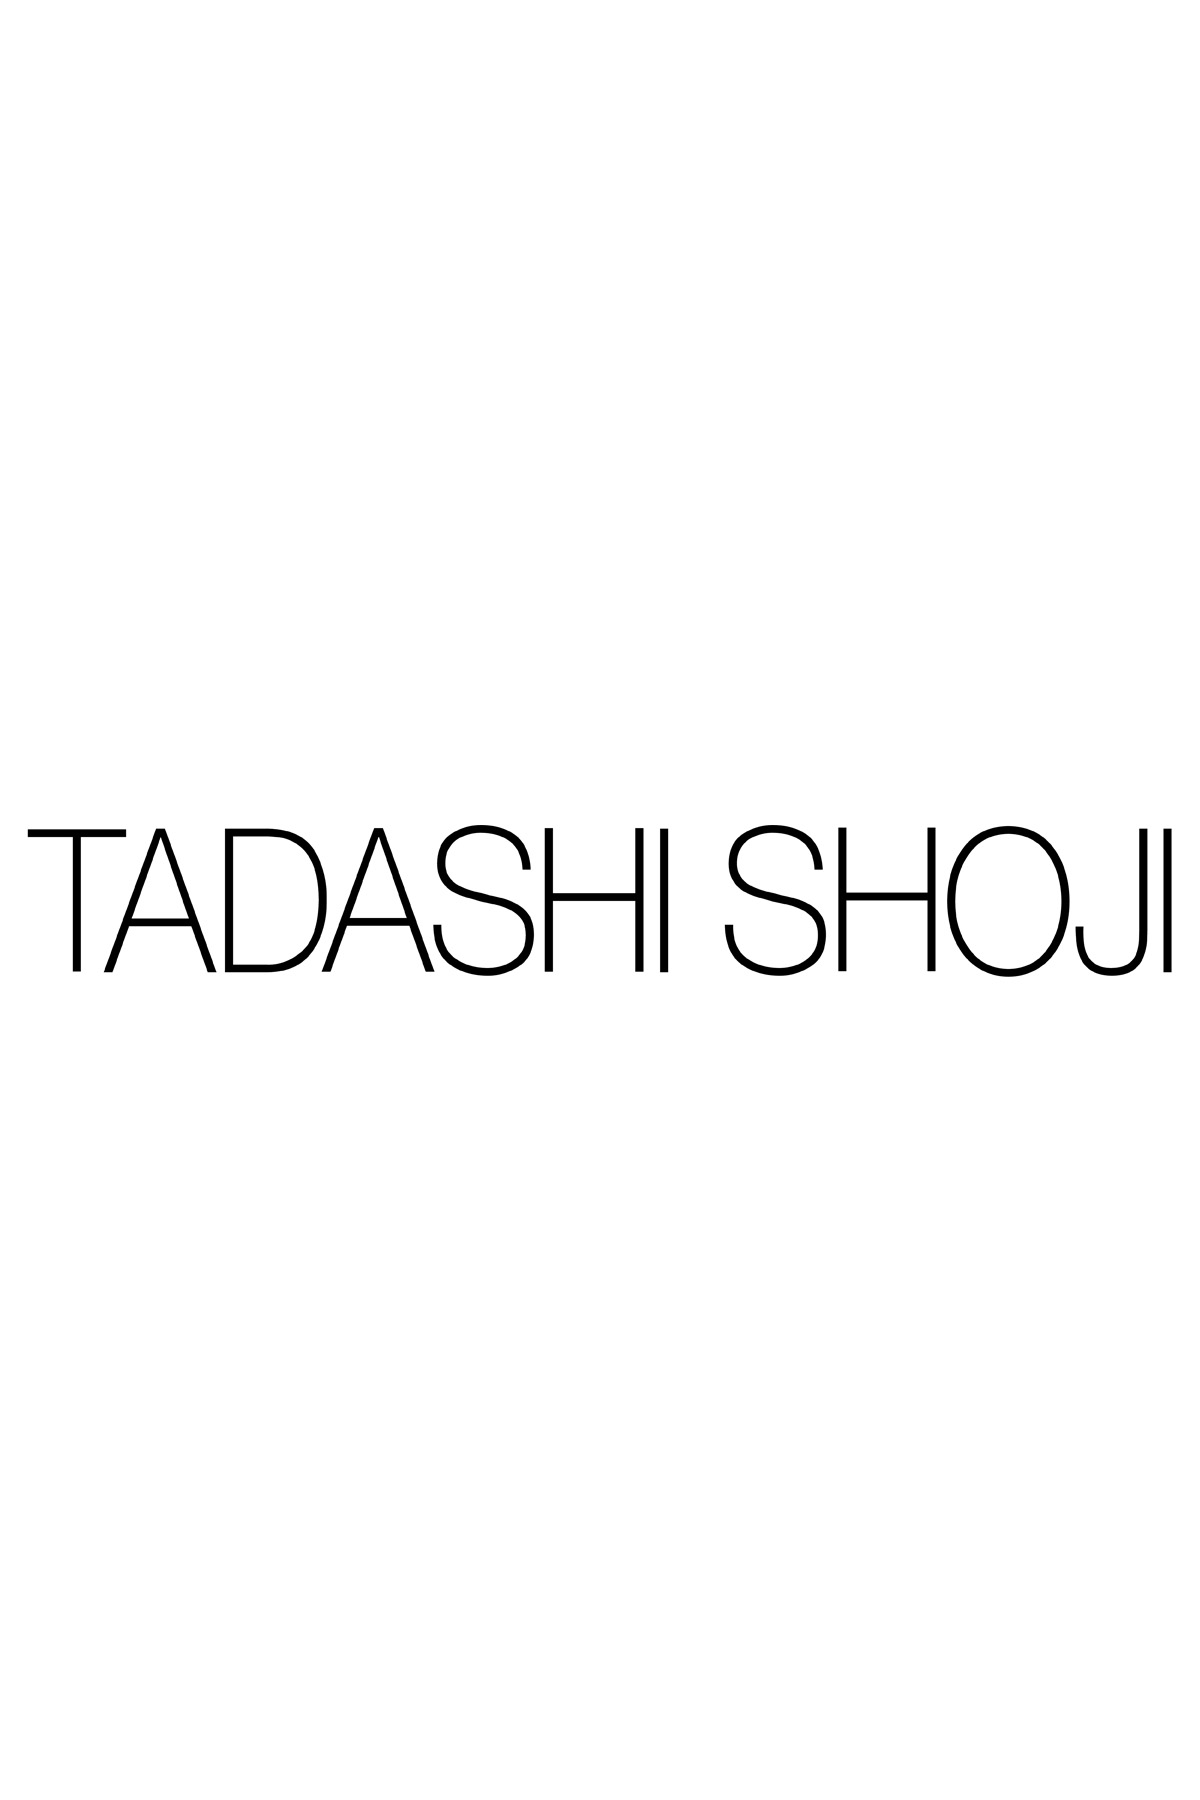 Tadashi Shoji - Rose Motif Collard Shirt Dress - Detail